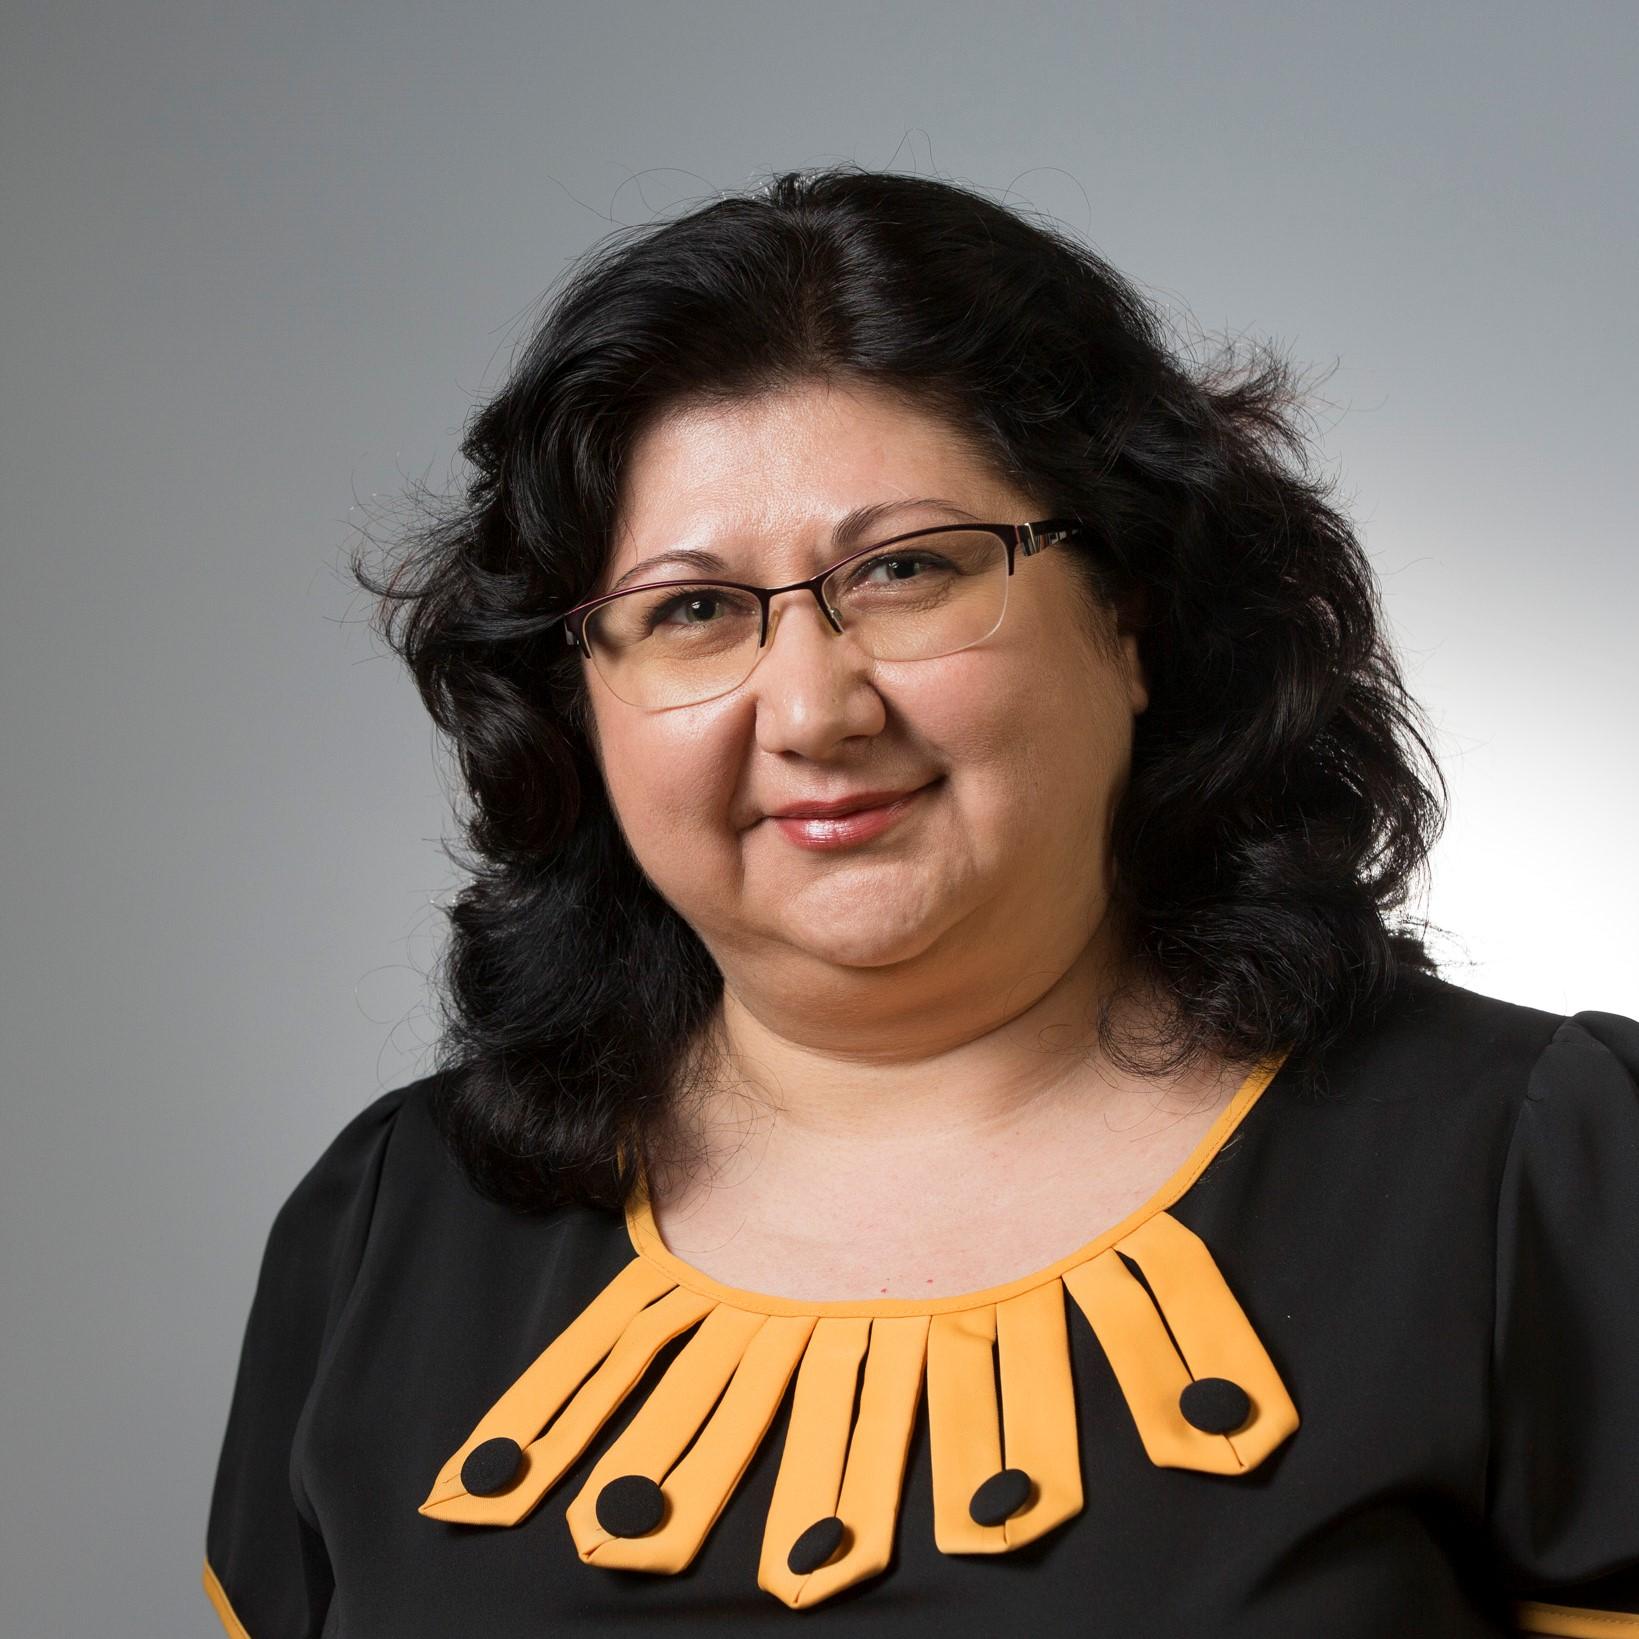 Natalia Manolova 2